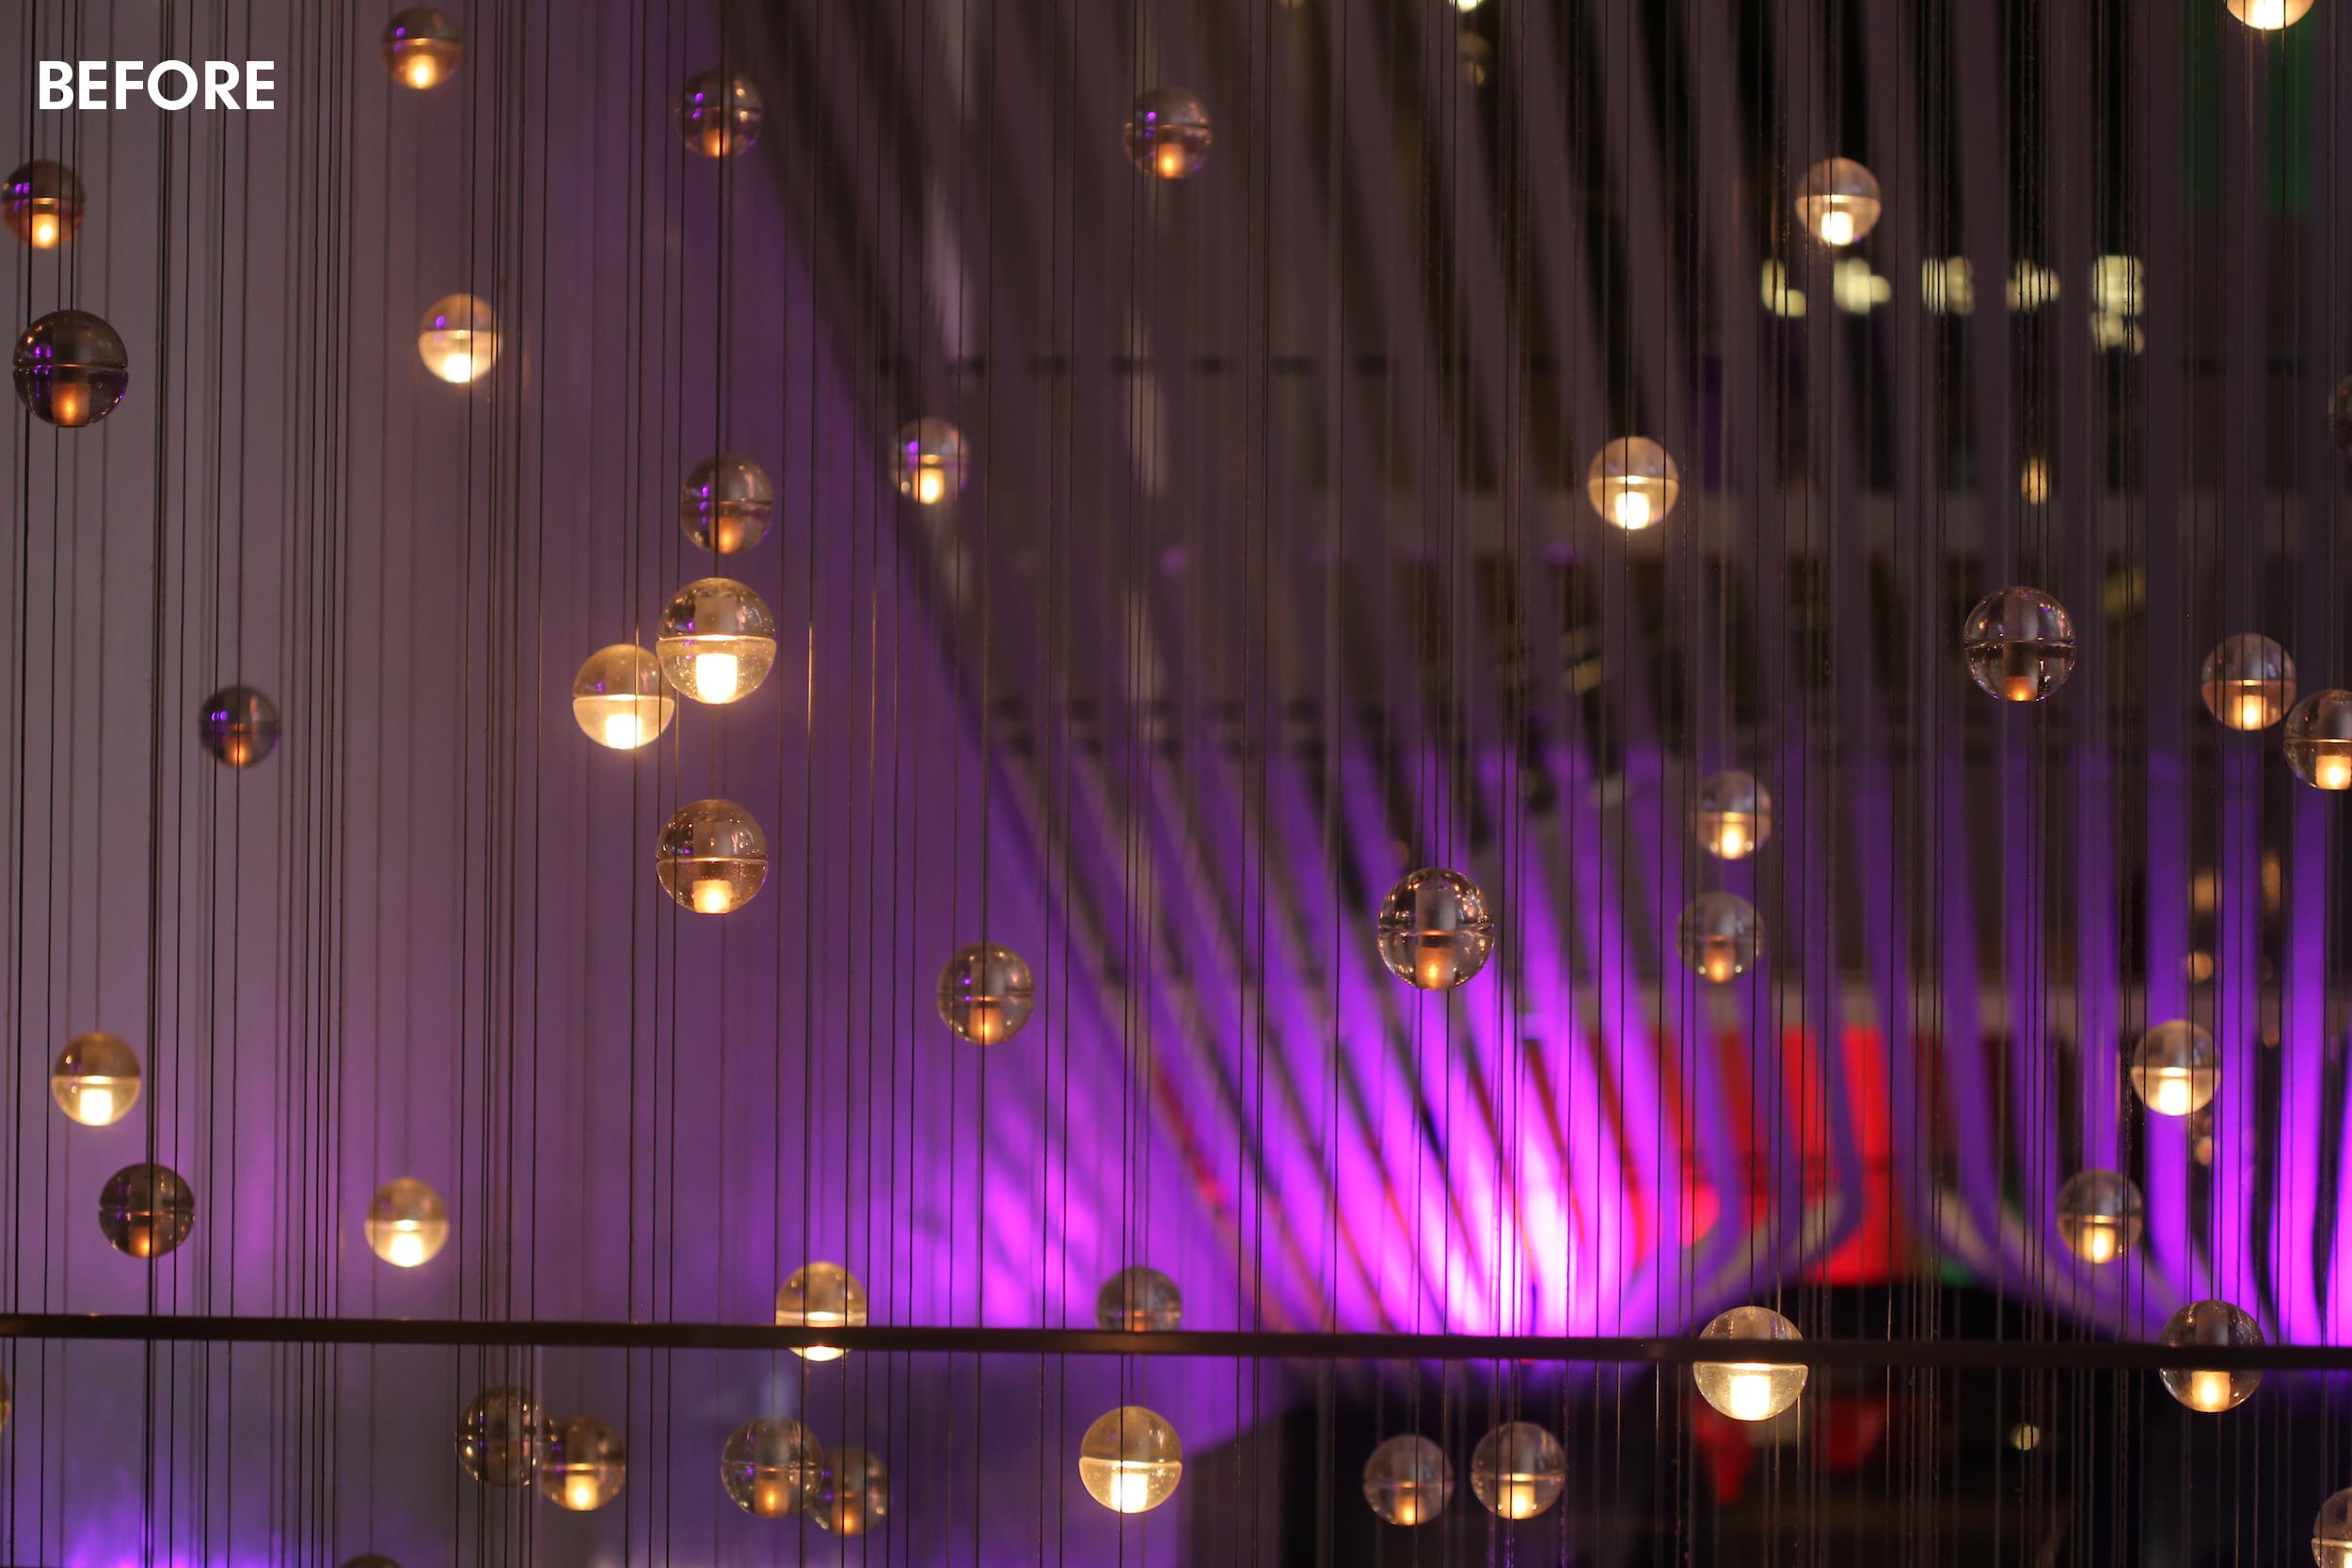 partylightschickpeach-lightroom-presets1.jpg